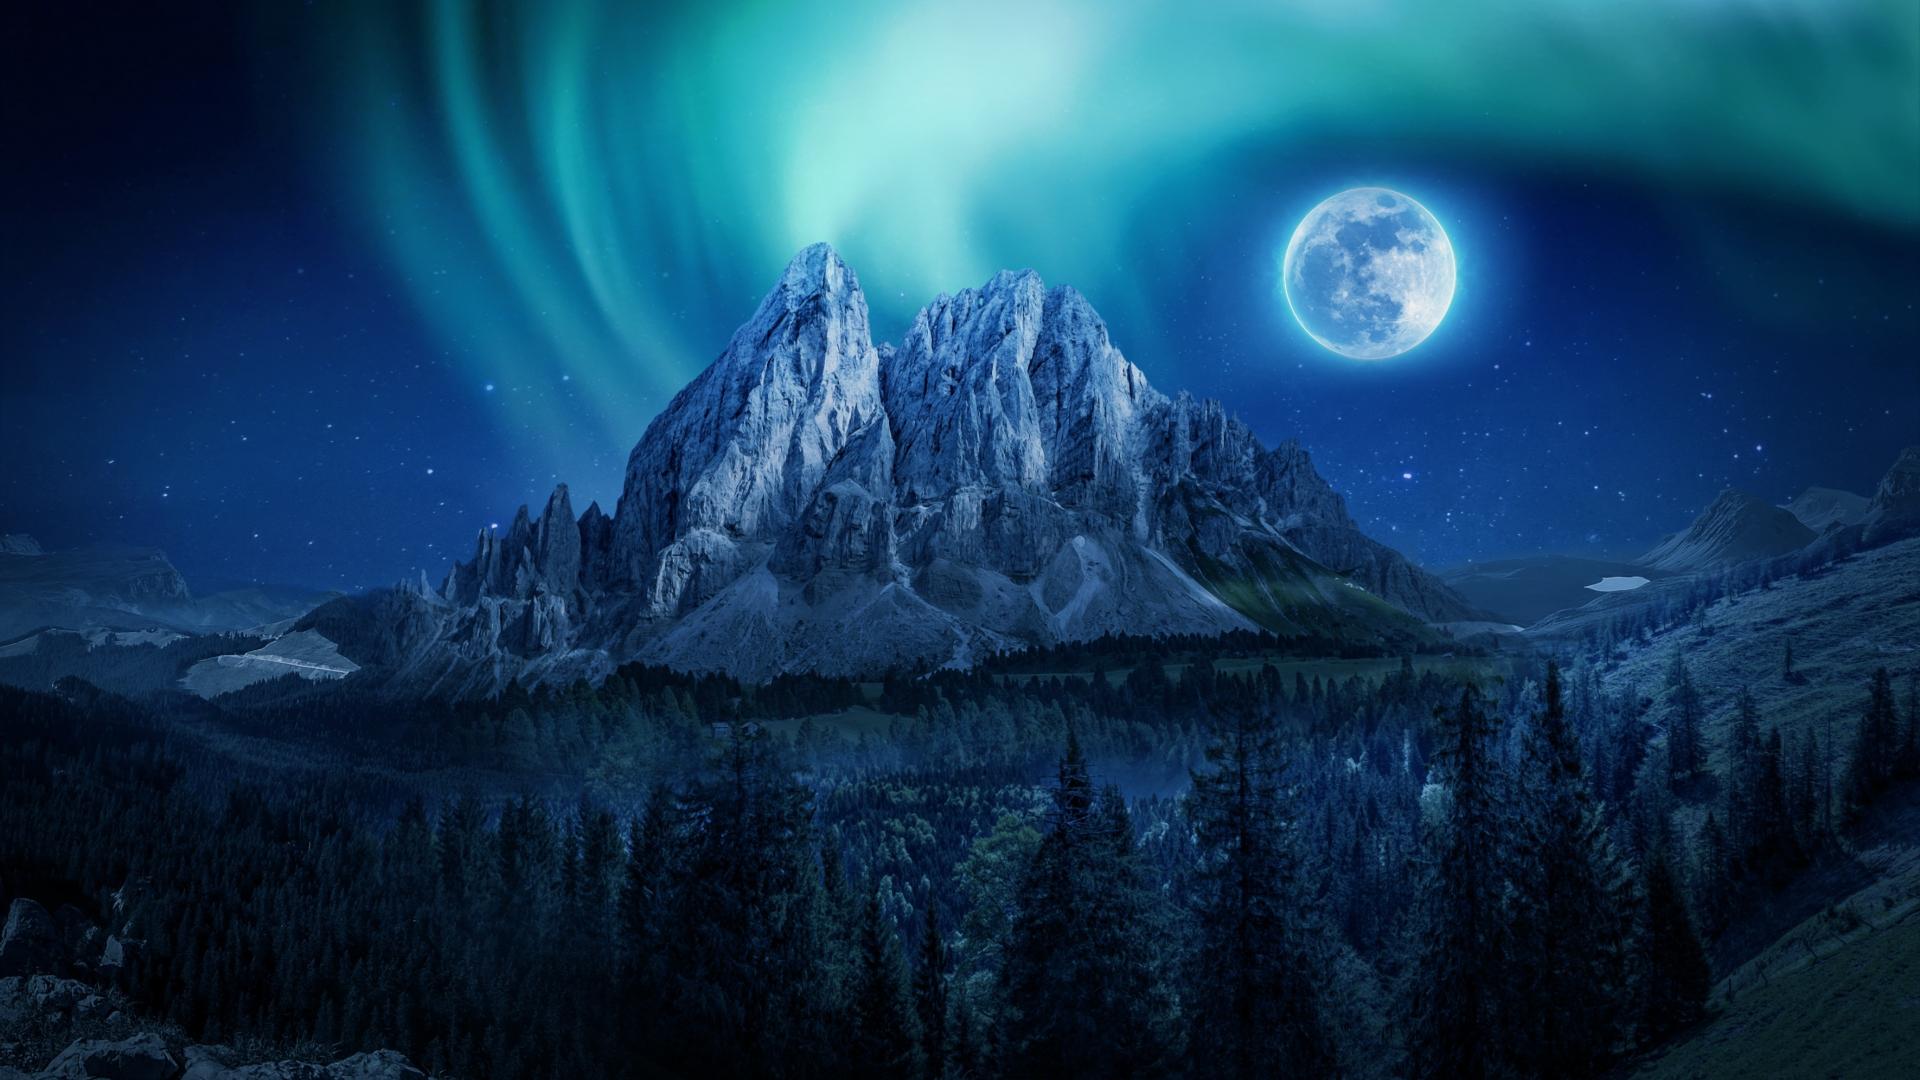 Download 1920x1080 Wallpaper Mountain Aurora Moon Night Full